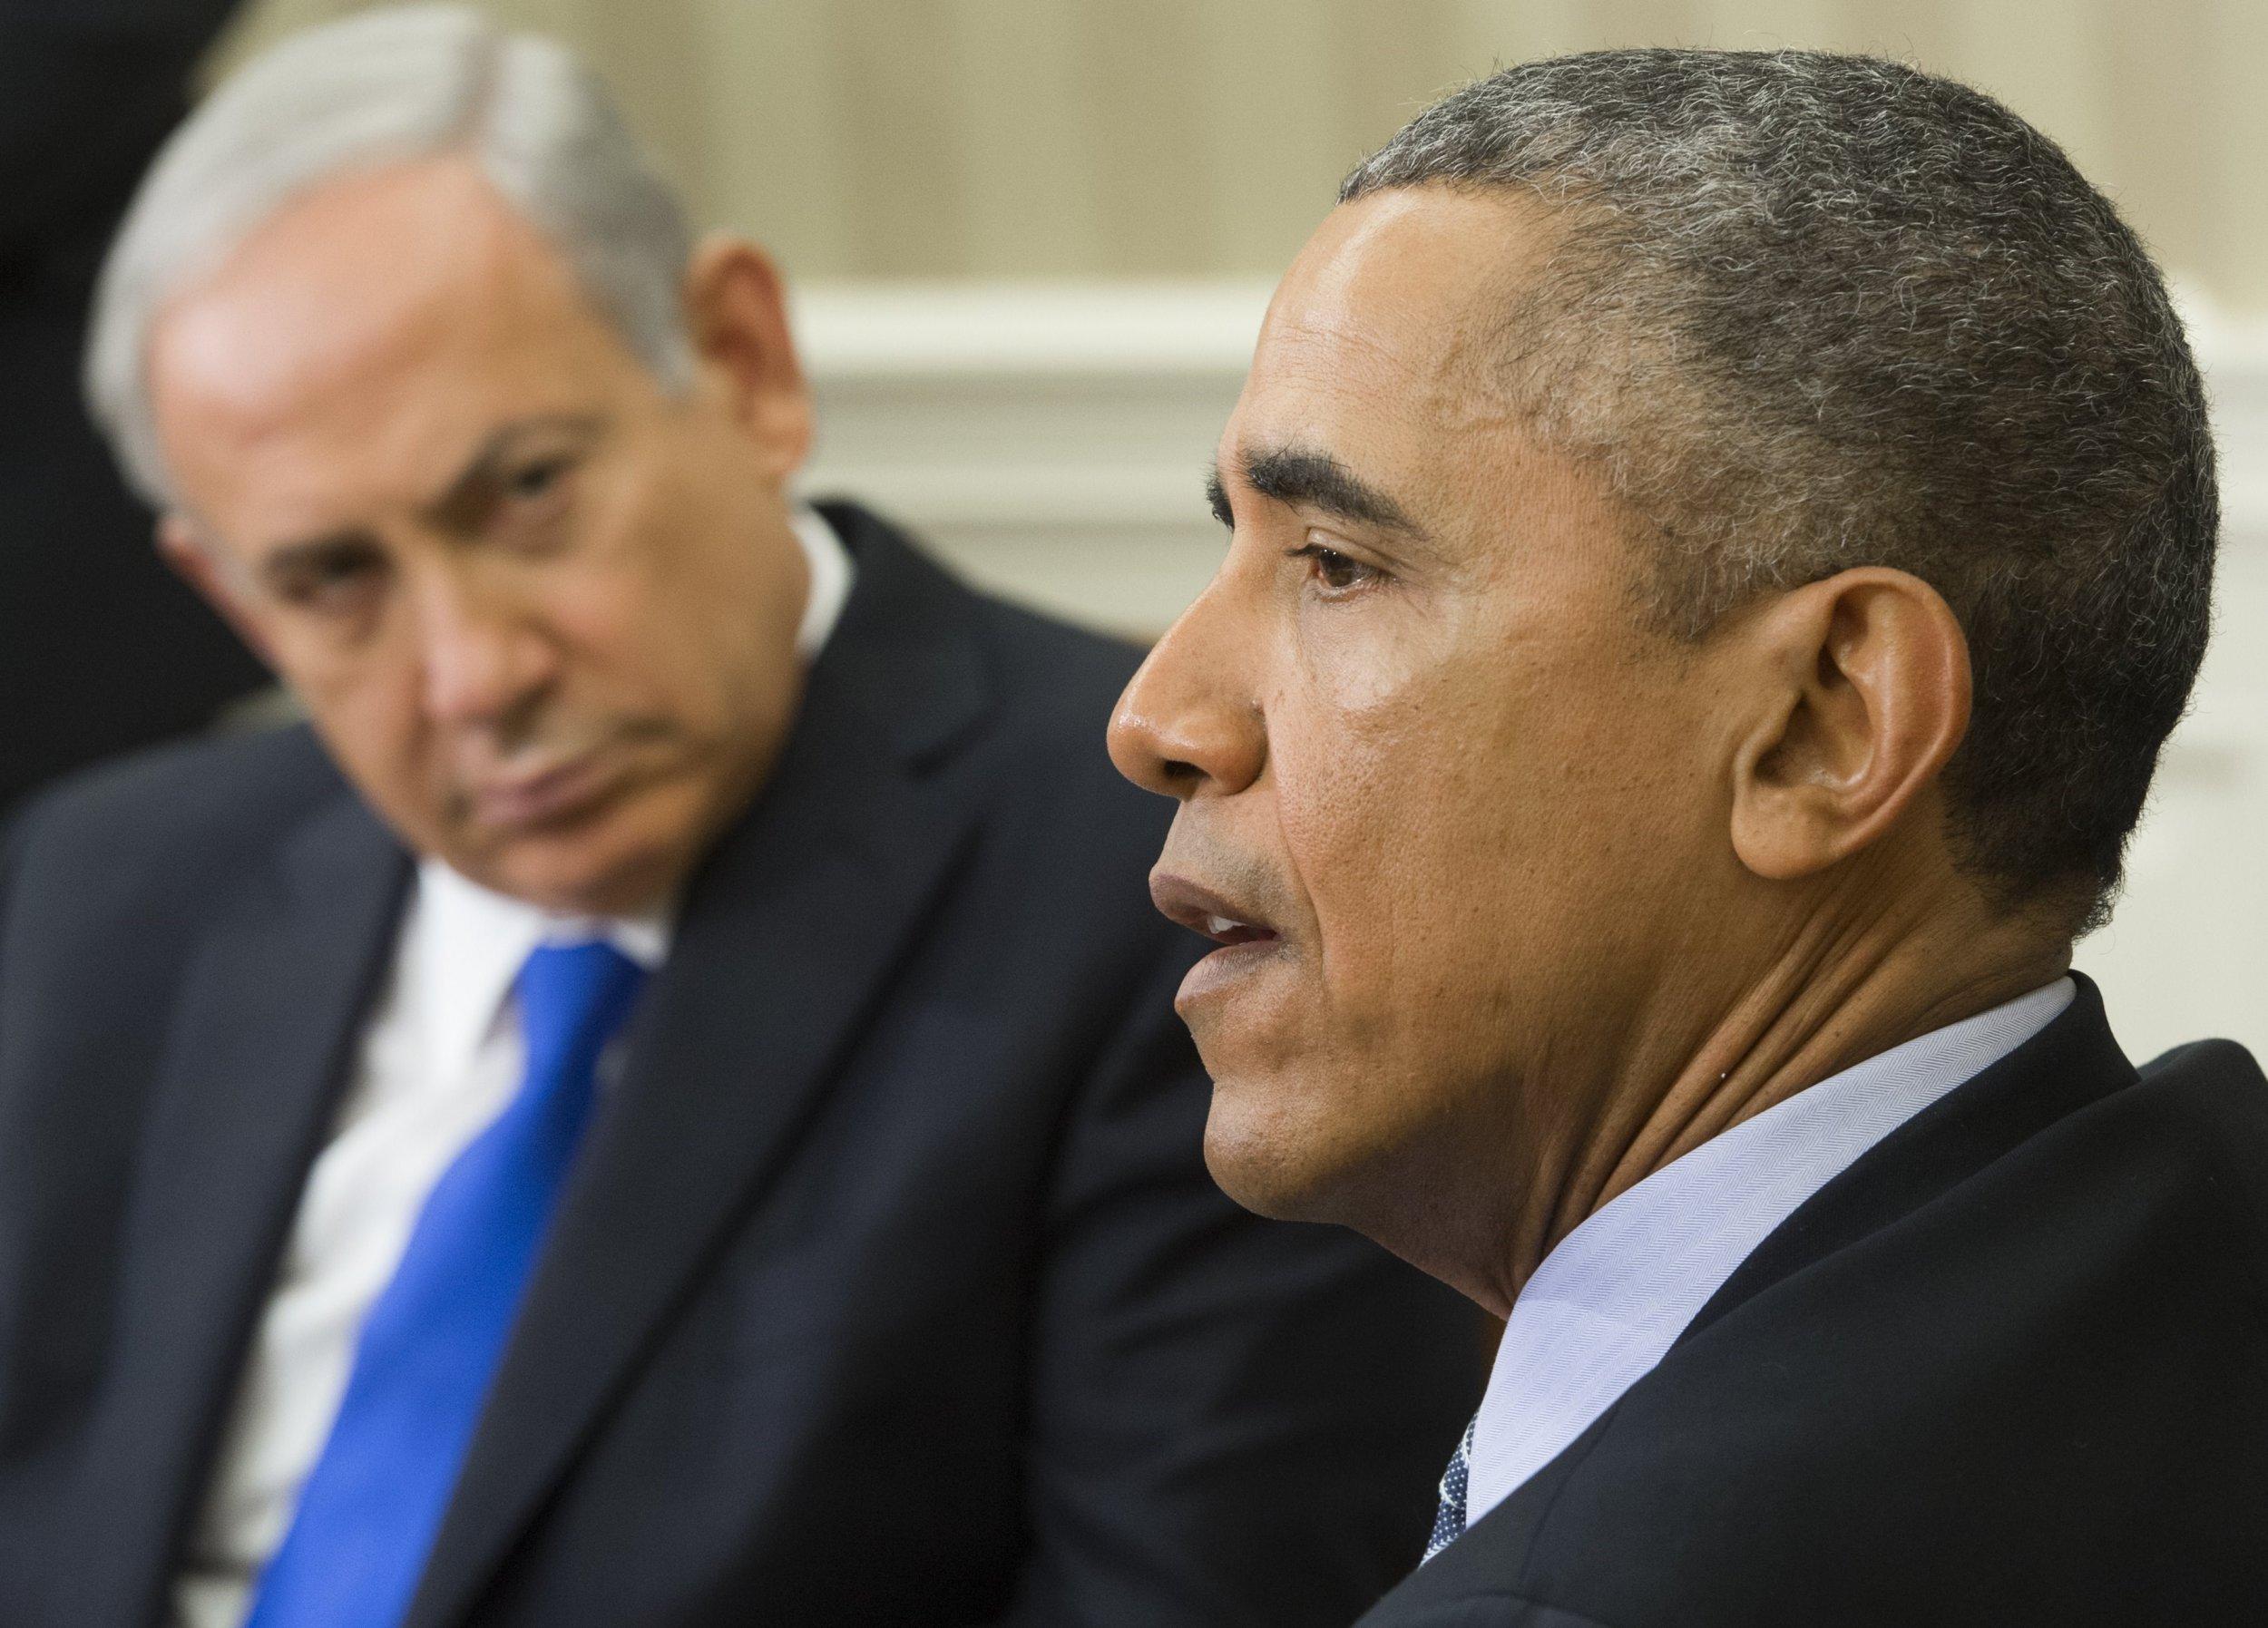 U.S. President Barack Obama and Israeli Prime Minister Benjamin Netanyahu